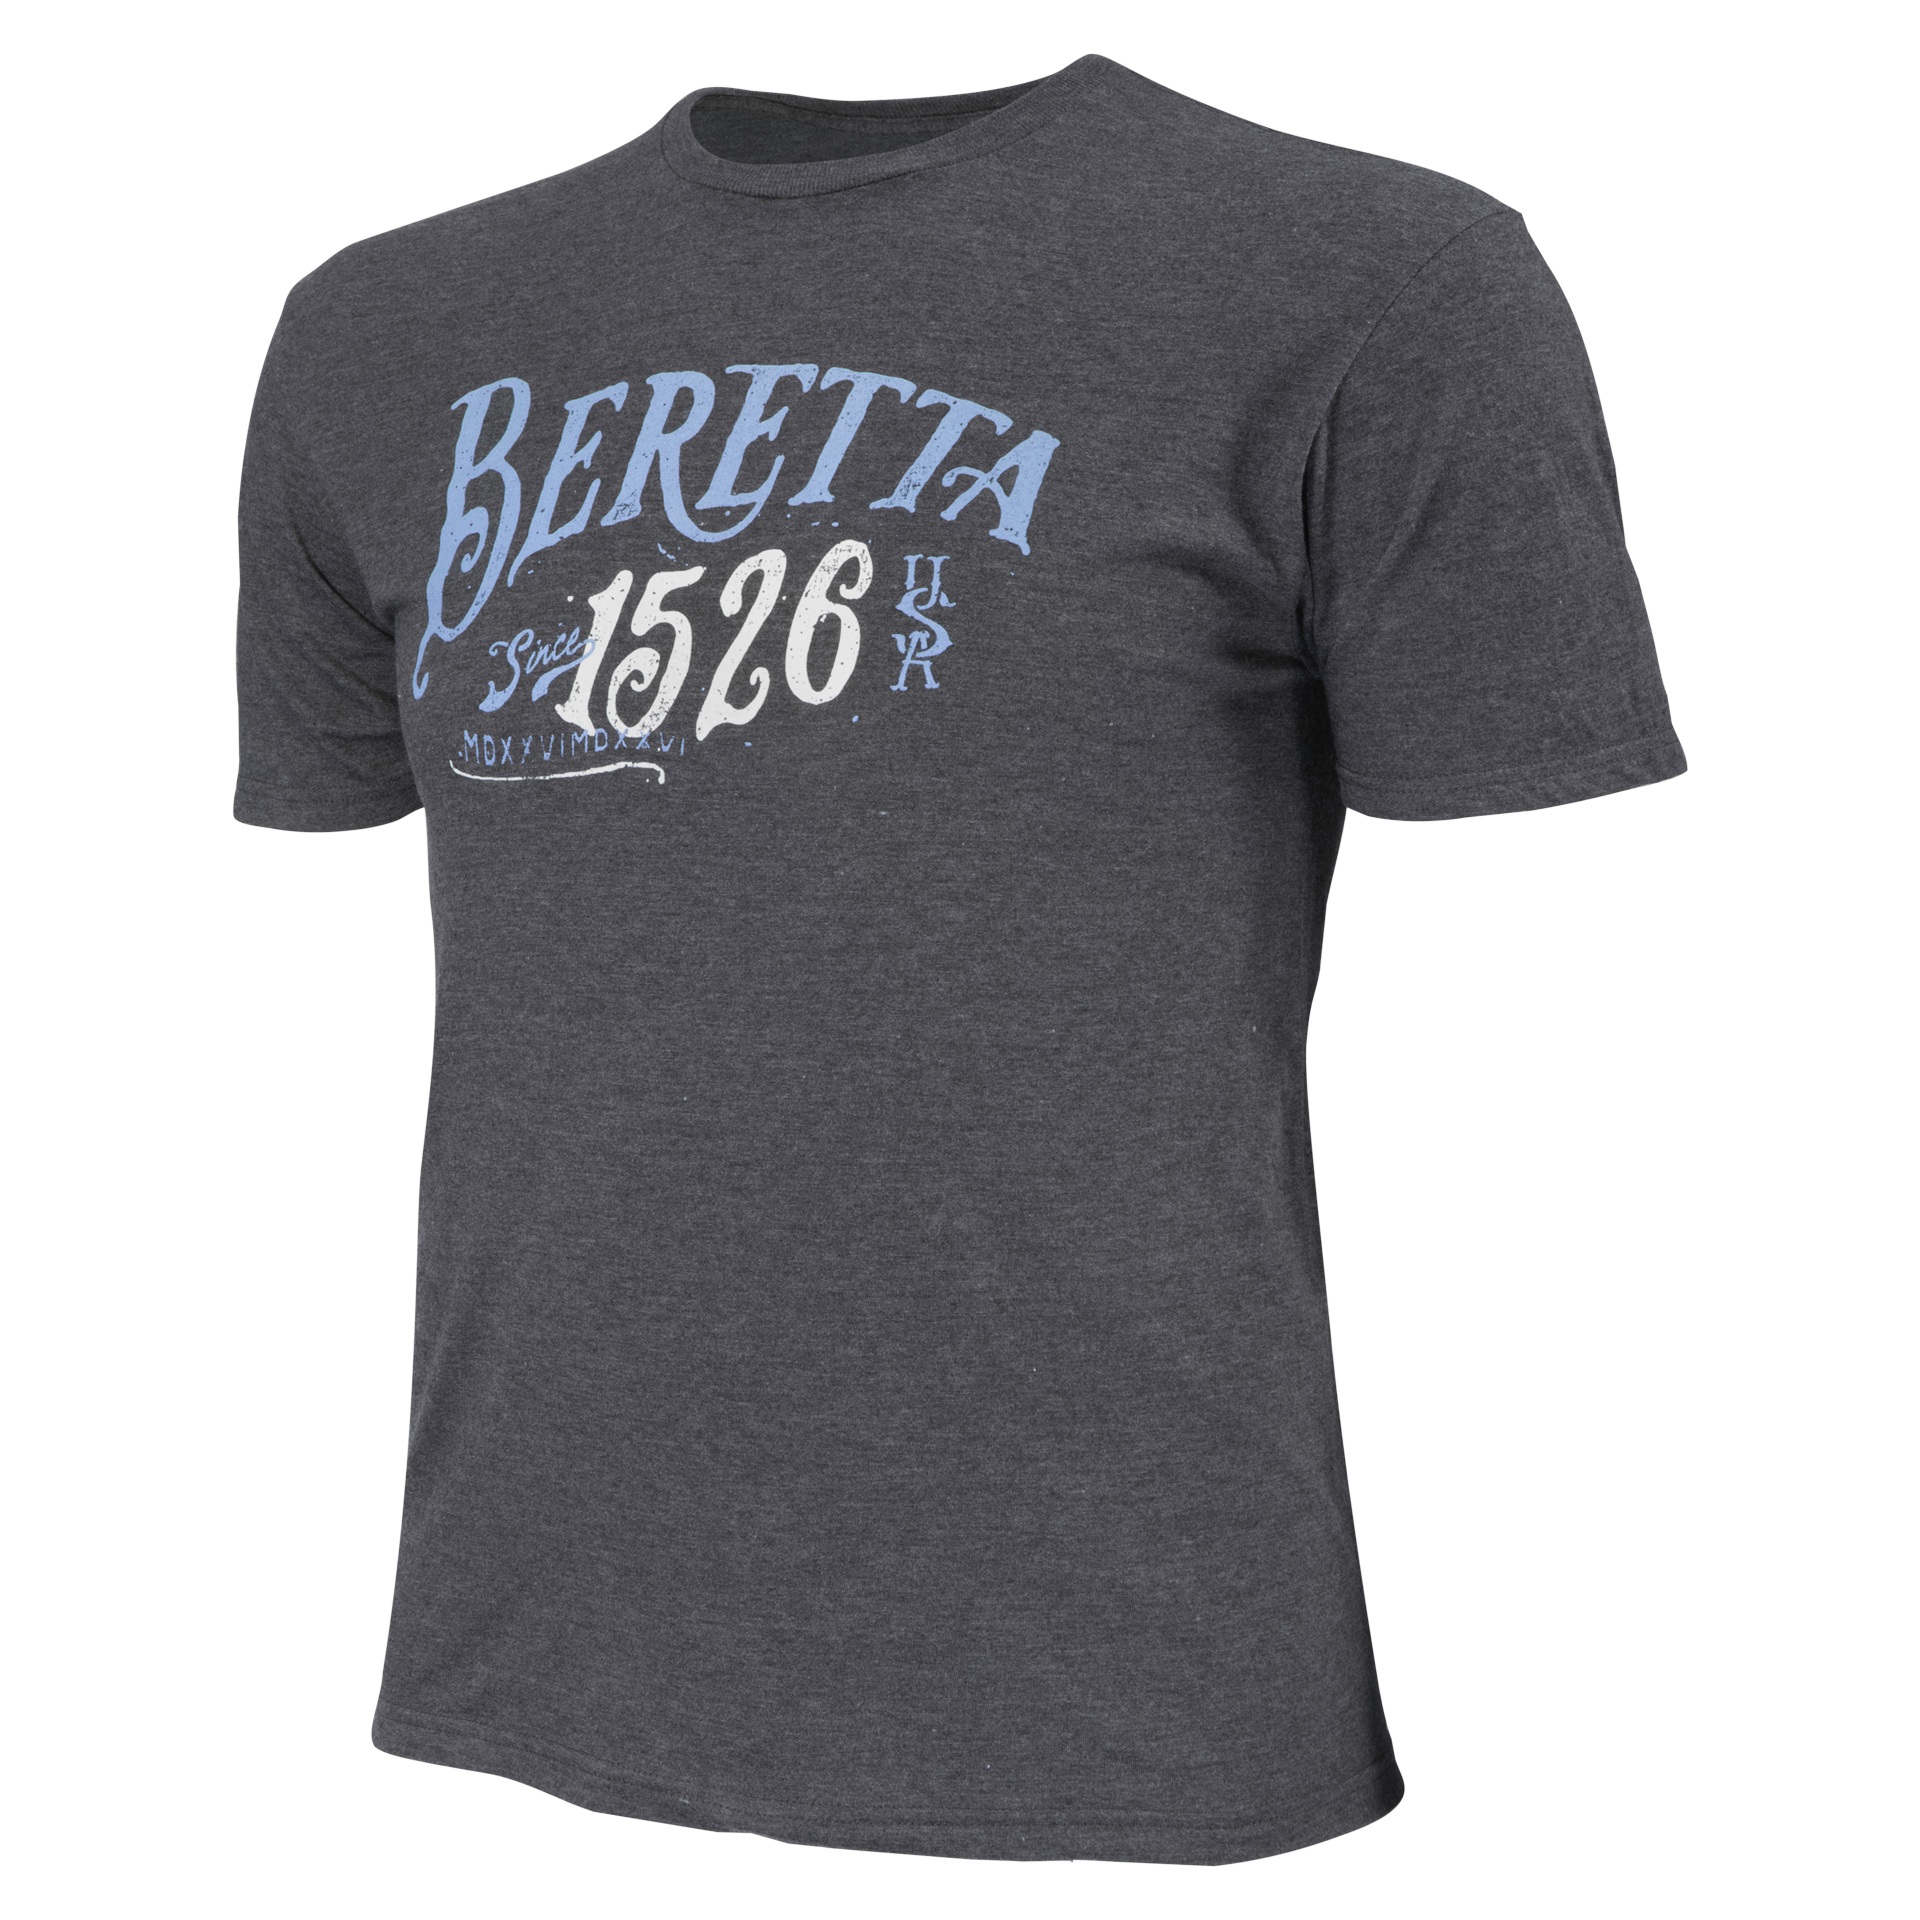 Image of BerettaUSA | 1526 Logo T-Shirt Charcoal, Cotton, Size: 2XL